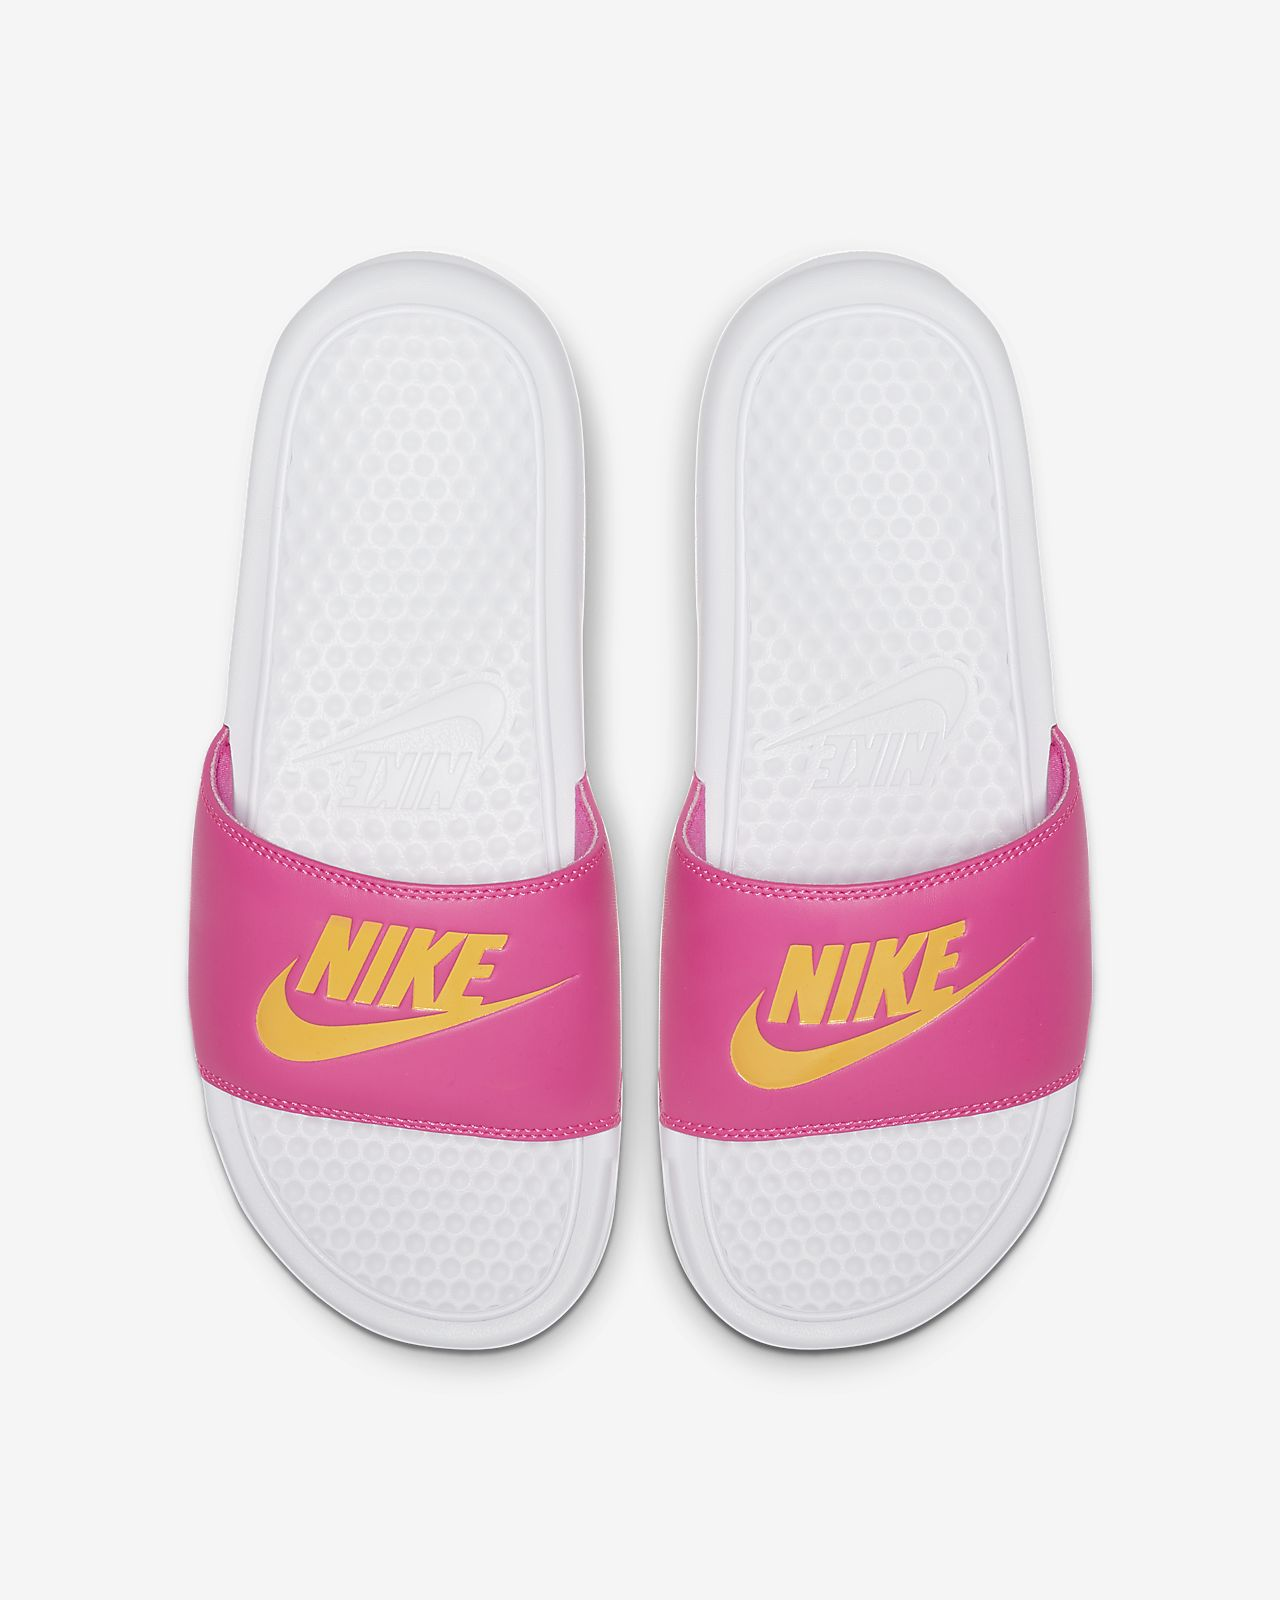 save off 62a04 3b34d Nike Benassi Women s Slide. Nike.com EG